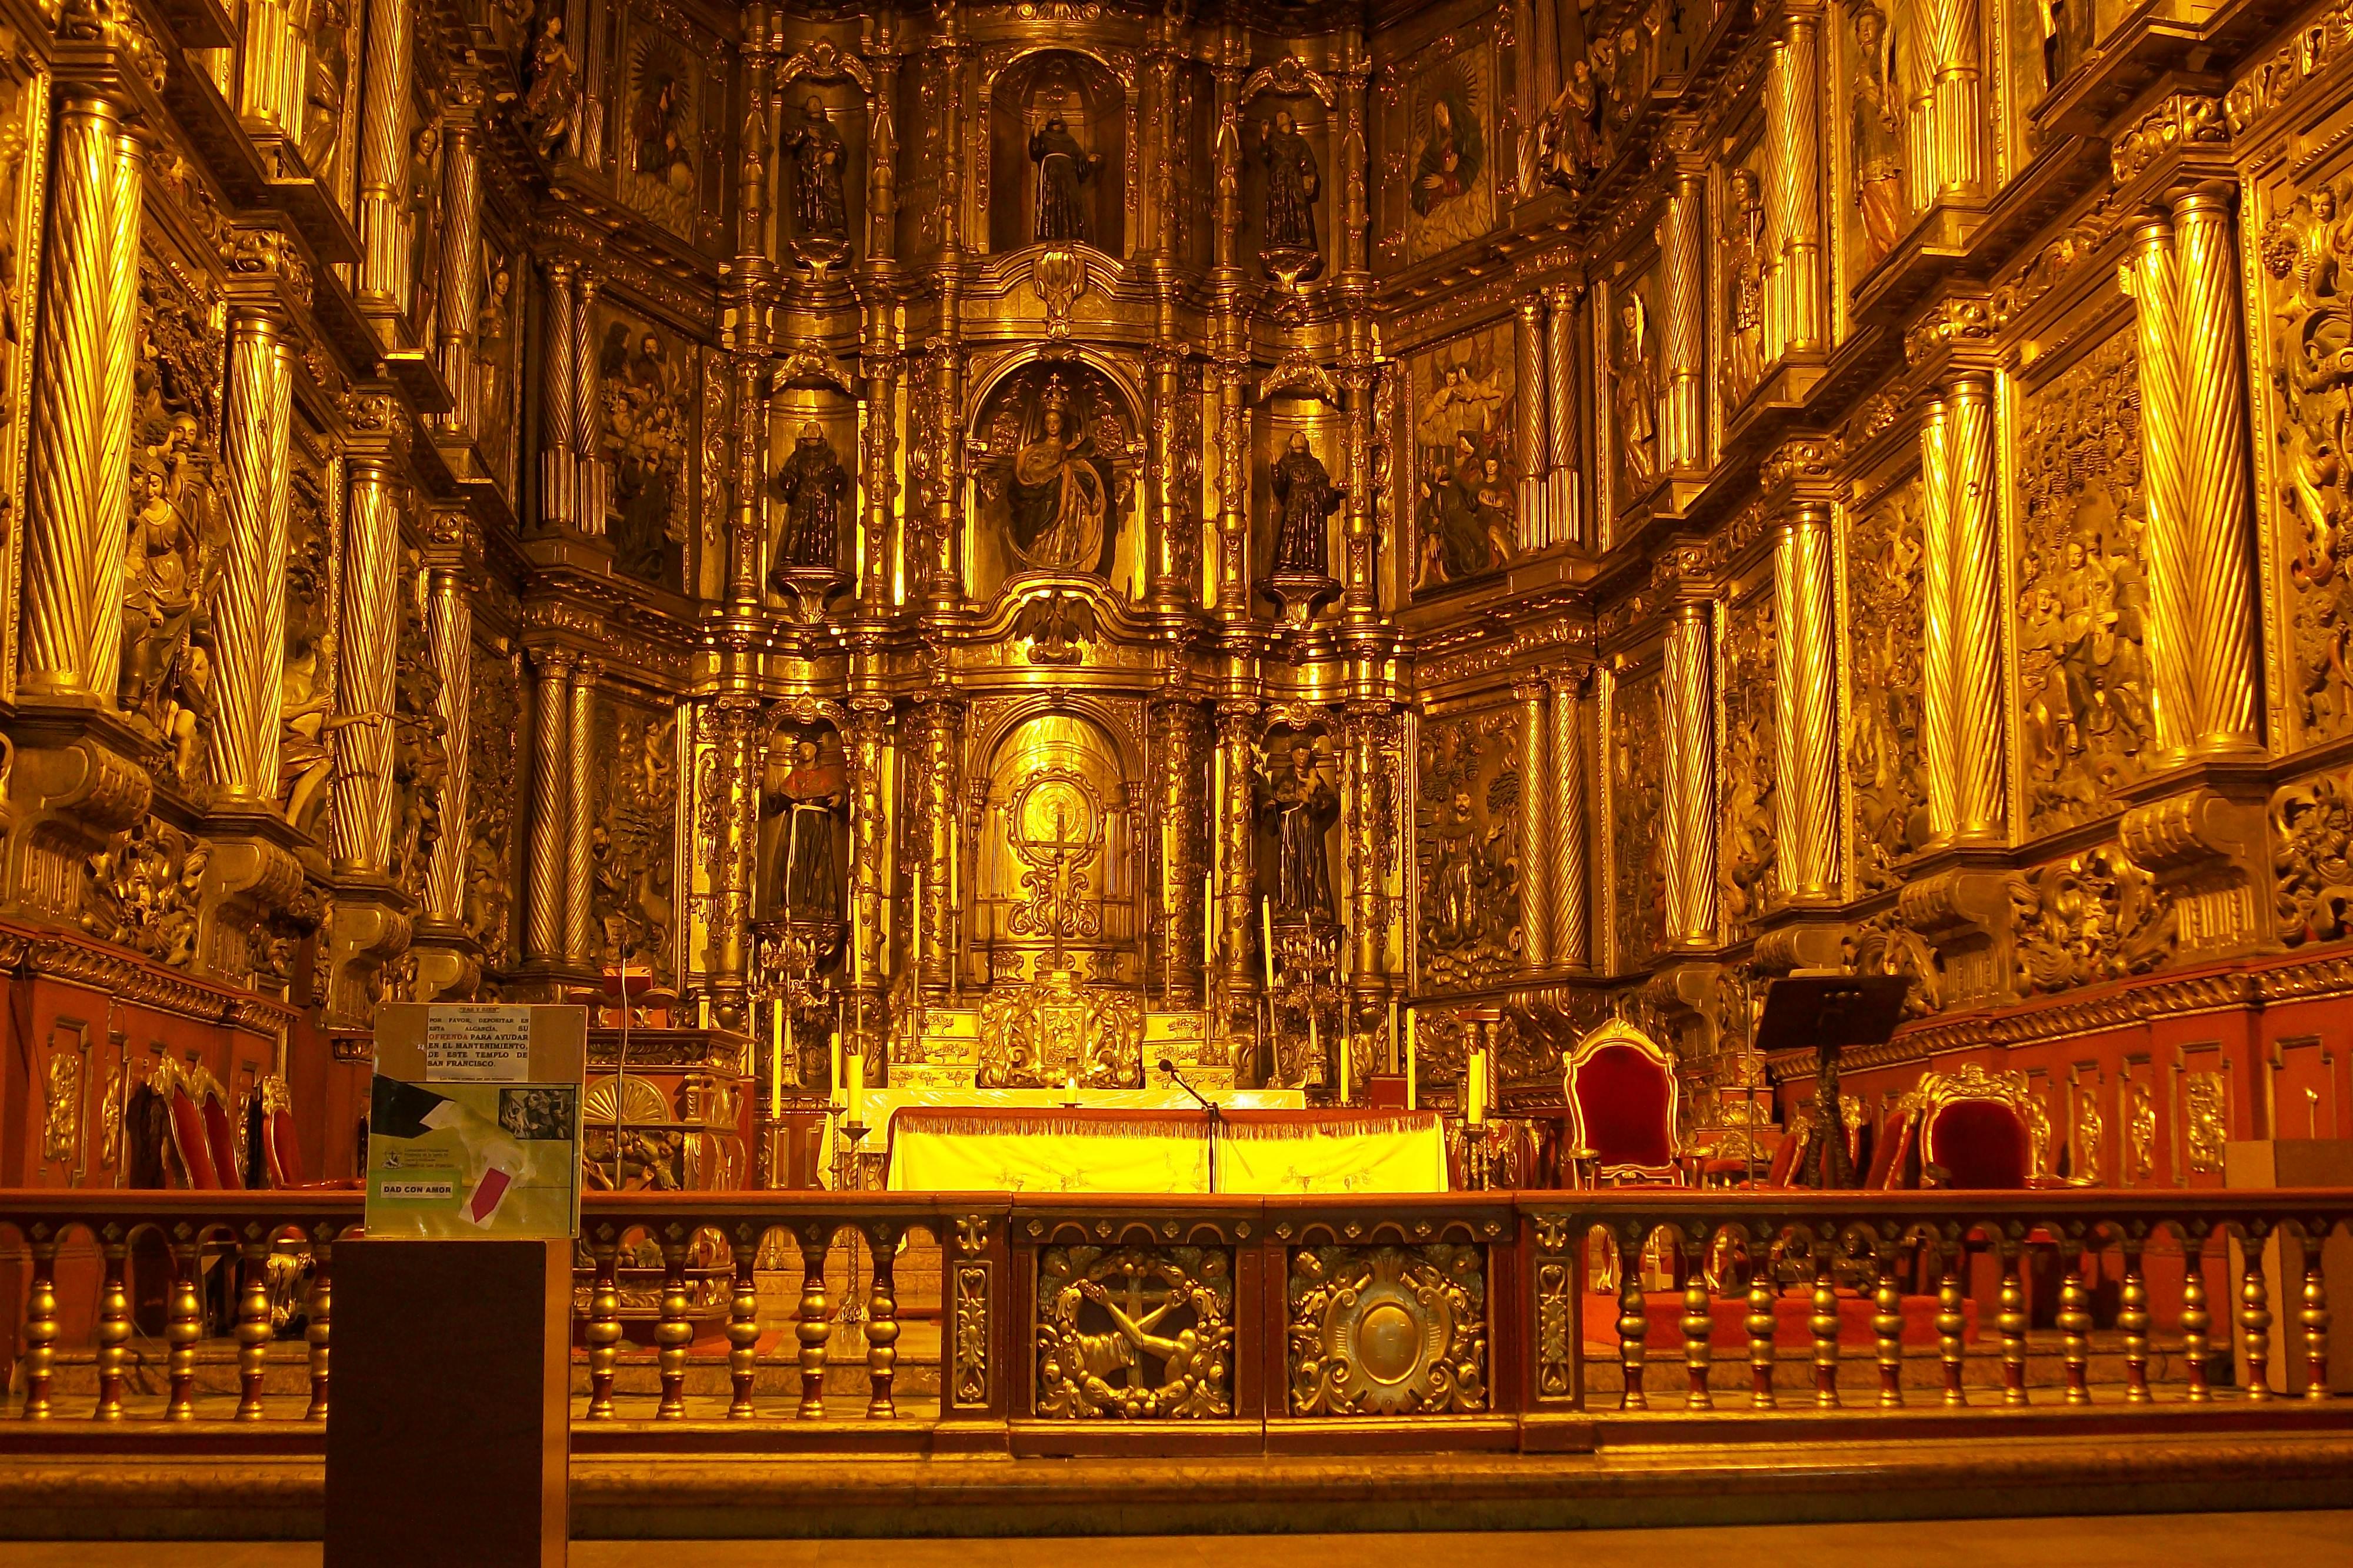 Archivo:Altar iglesia de San Francisco.JPG - Wikipedia, la enciclopedia  libre